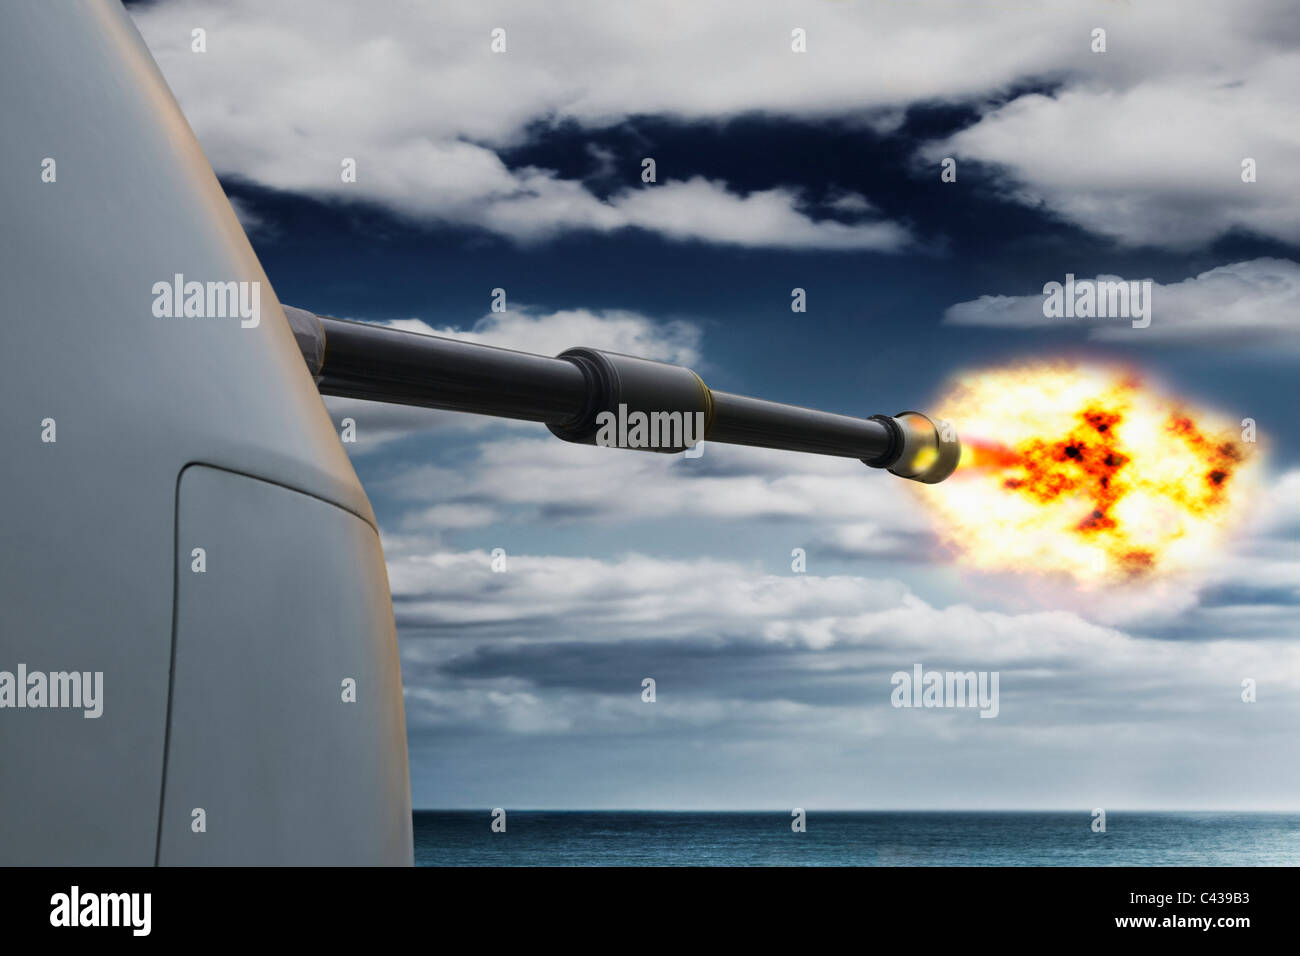 digitally enhanced,,Royal navy 4.5 inch MK 8 Gun firing - Stock Image